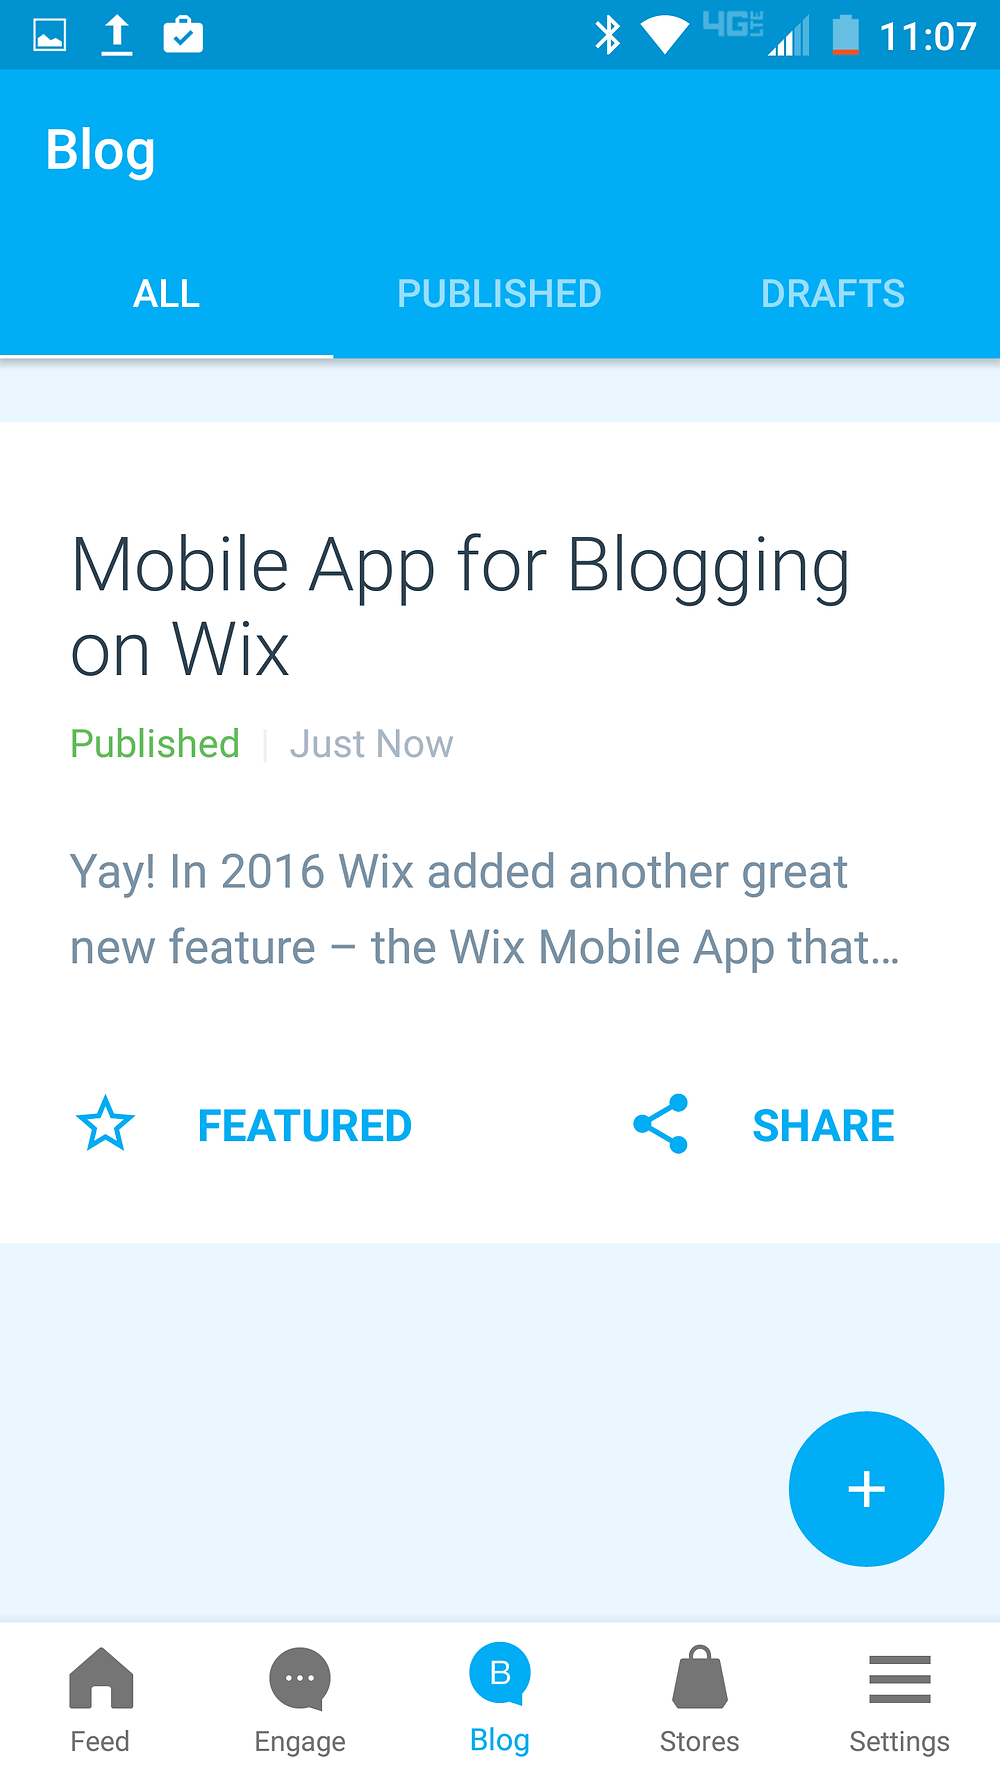 Wix Mobile App